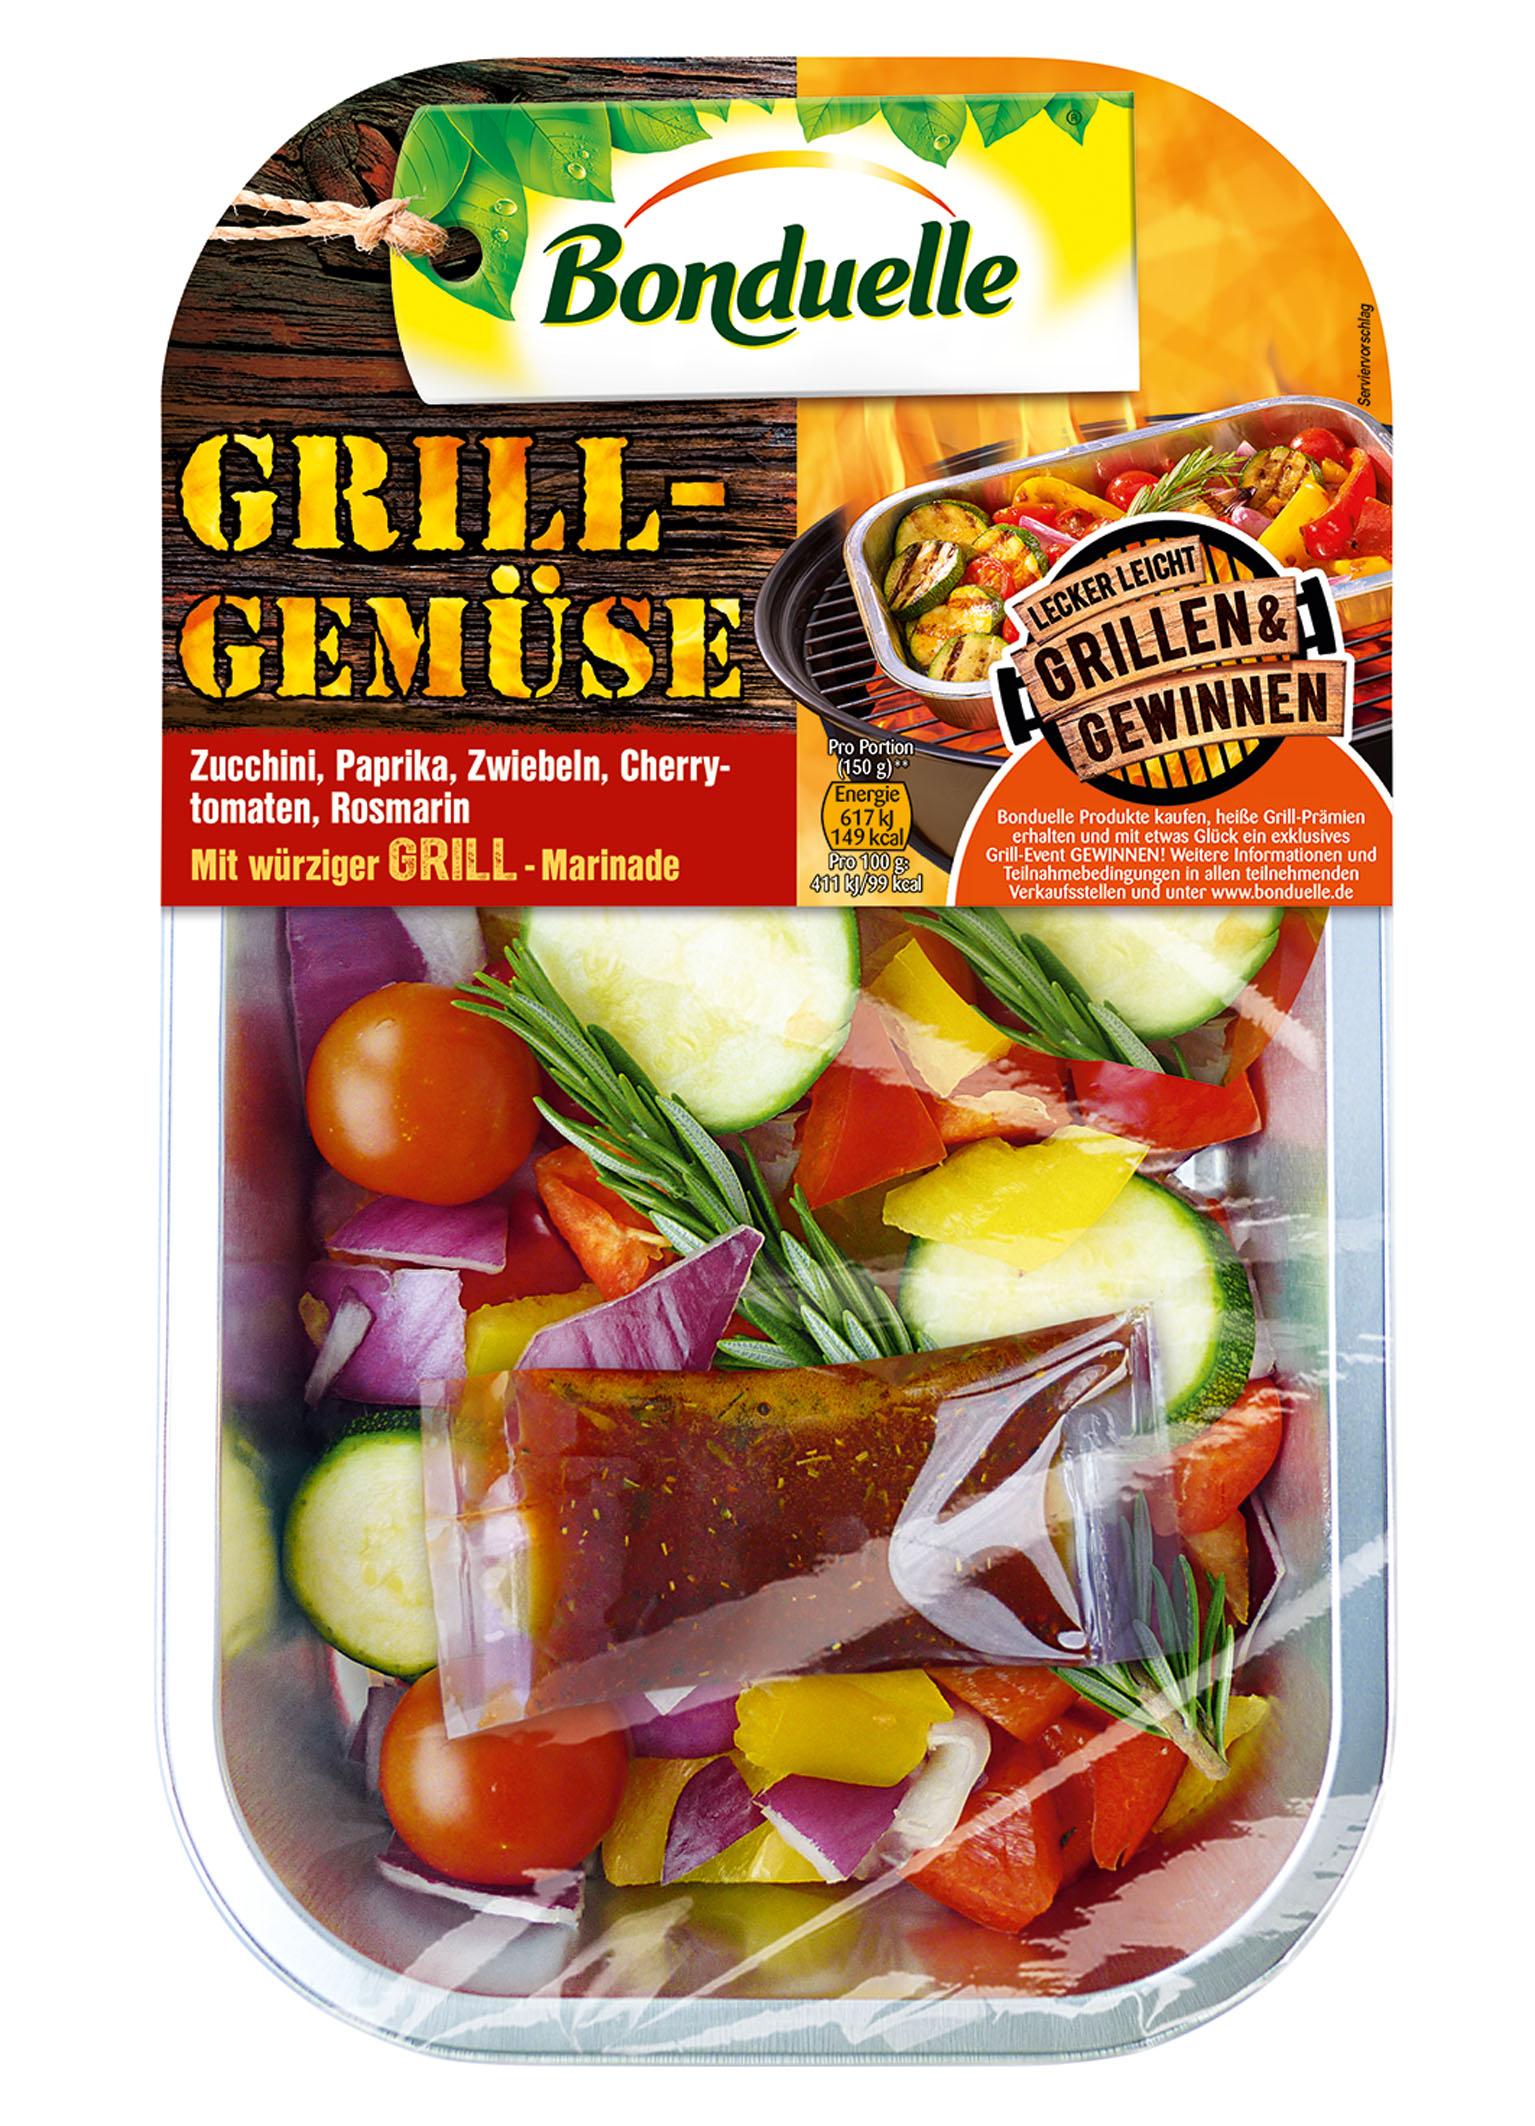 neu limitiert bonduelle grill gem se grill salat food monitor. Black Bedroom Furniture Sets. Home Design Ideas